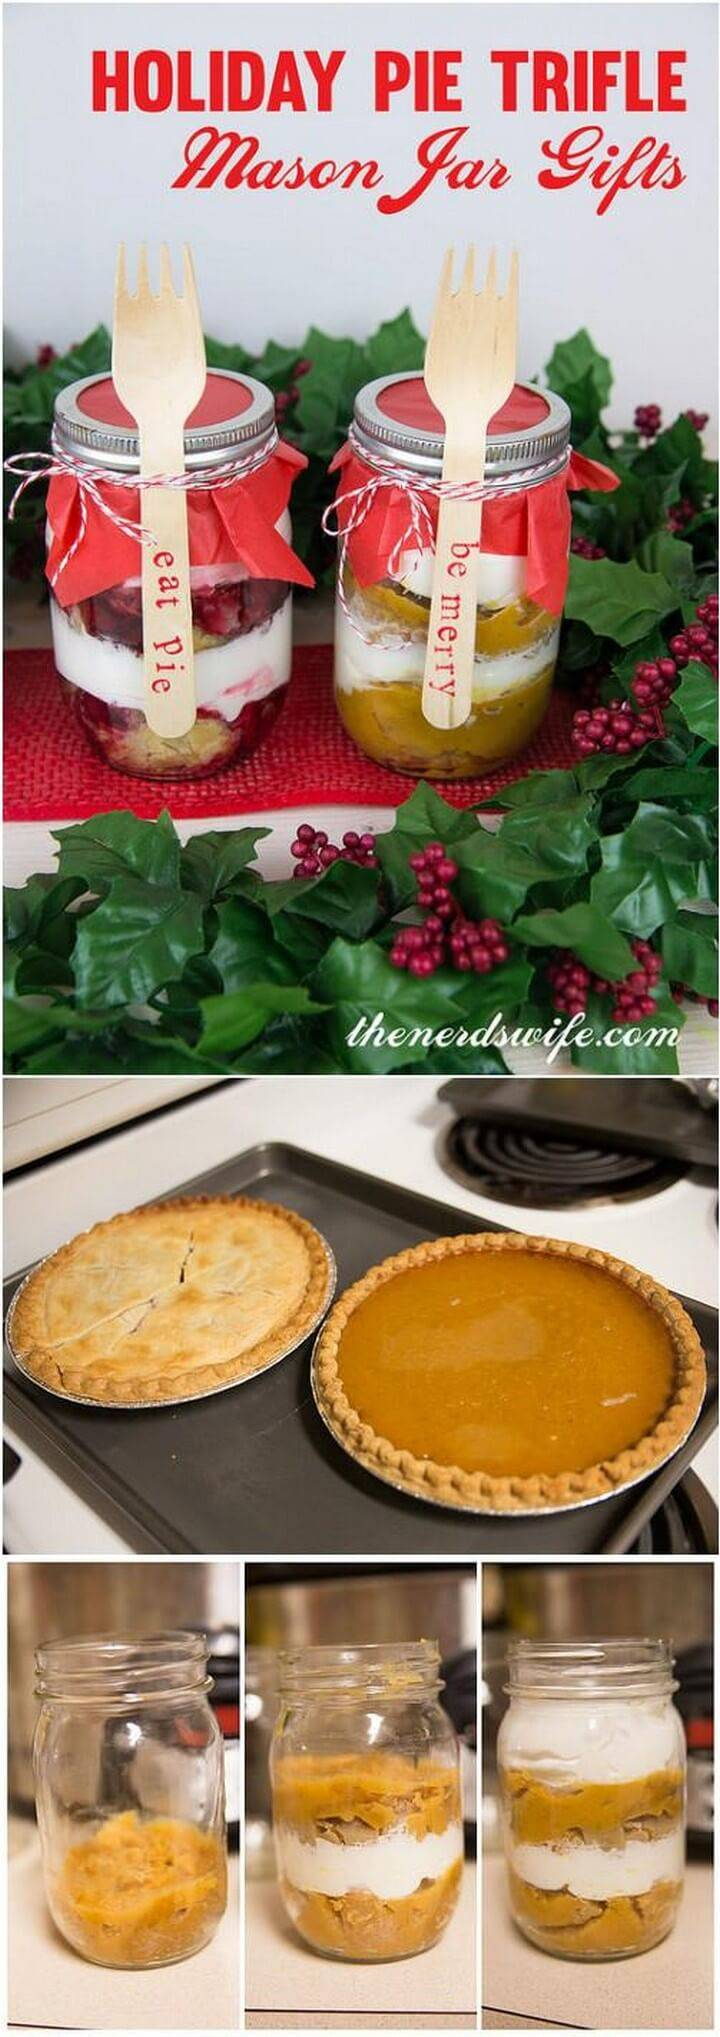 DIY Great Holiday Pie Trifle Mason Jar Gifts